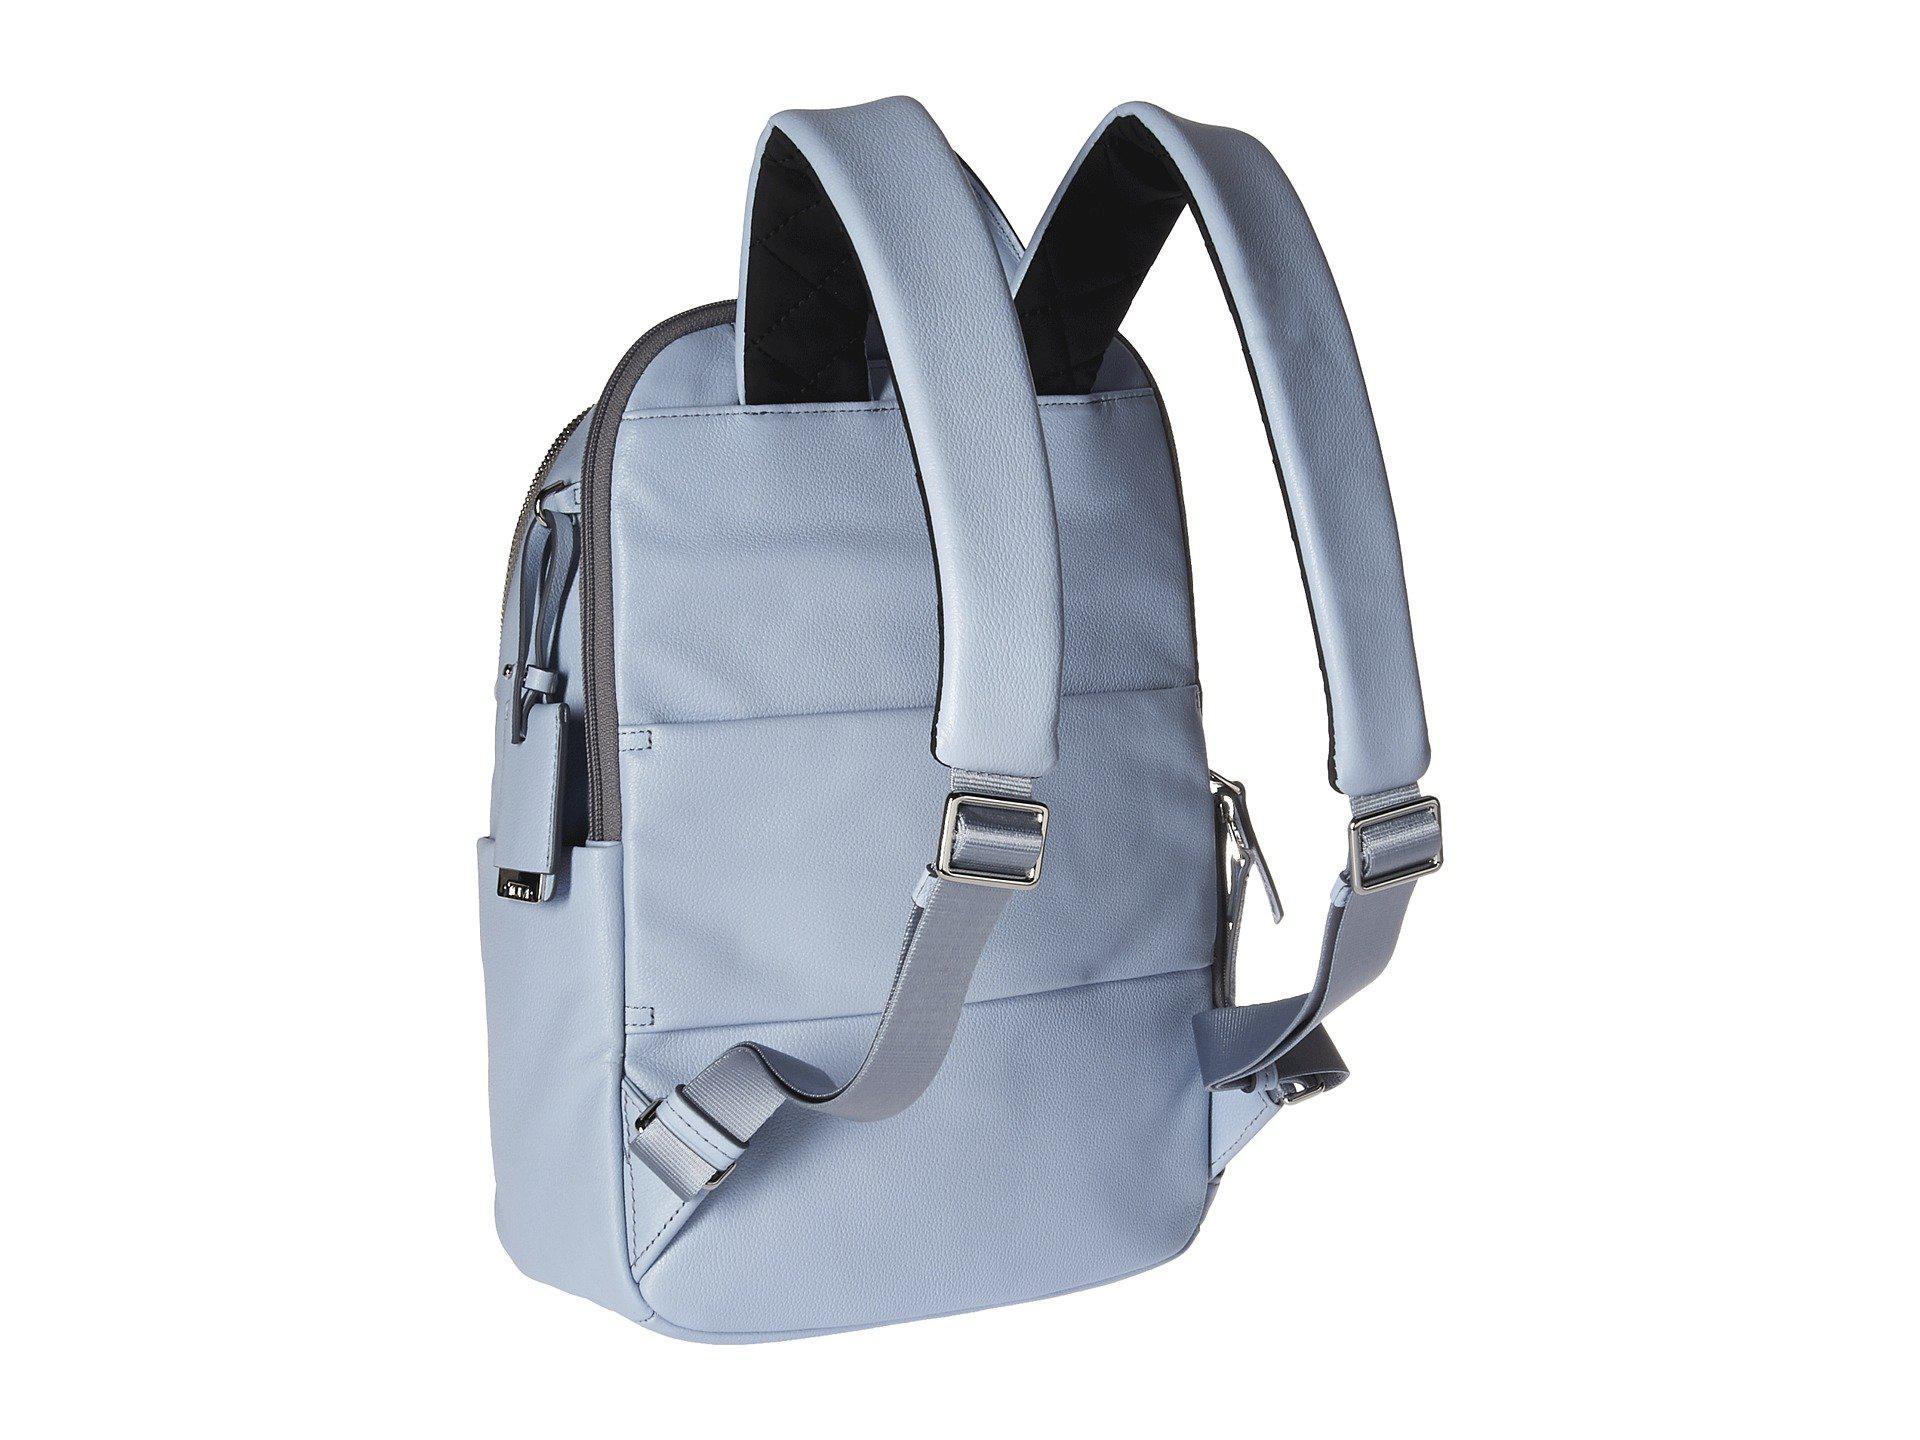 Lyst - Tumi Voyageur Leather Daniella Small Backpack (light Blue ... 6cf3e61a39